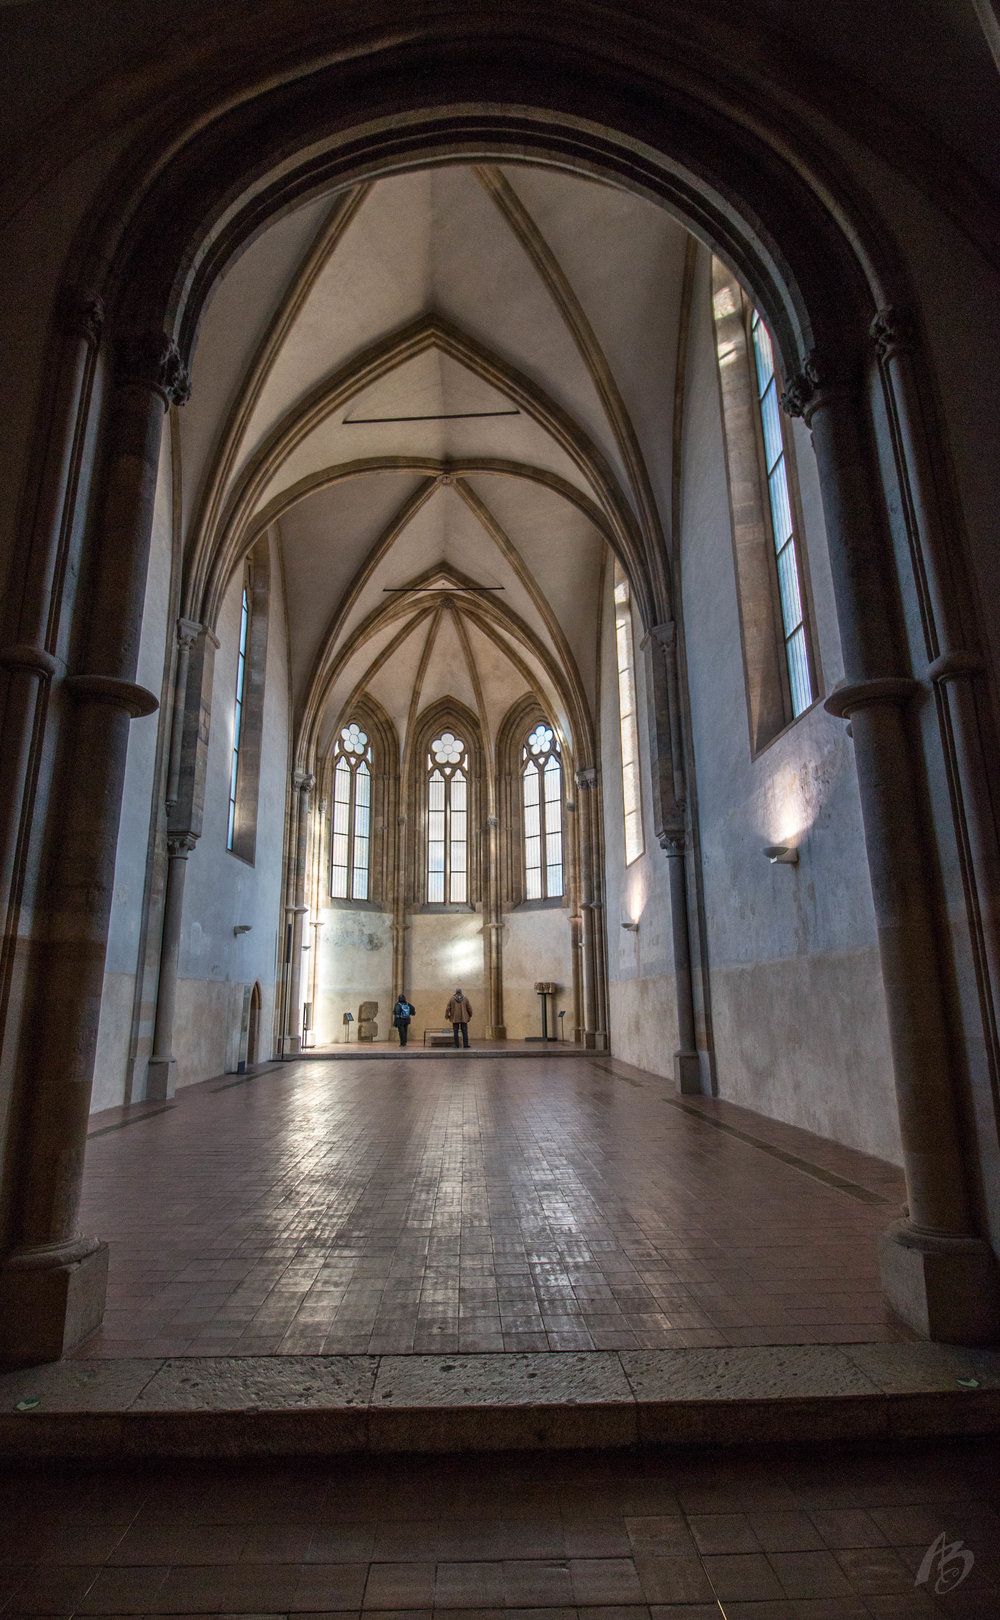 Convent of St. Agnes